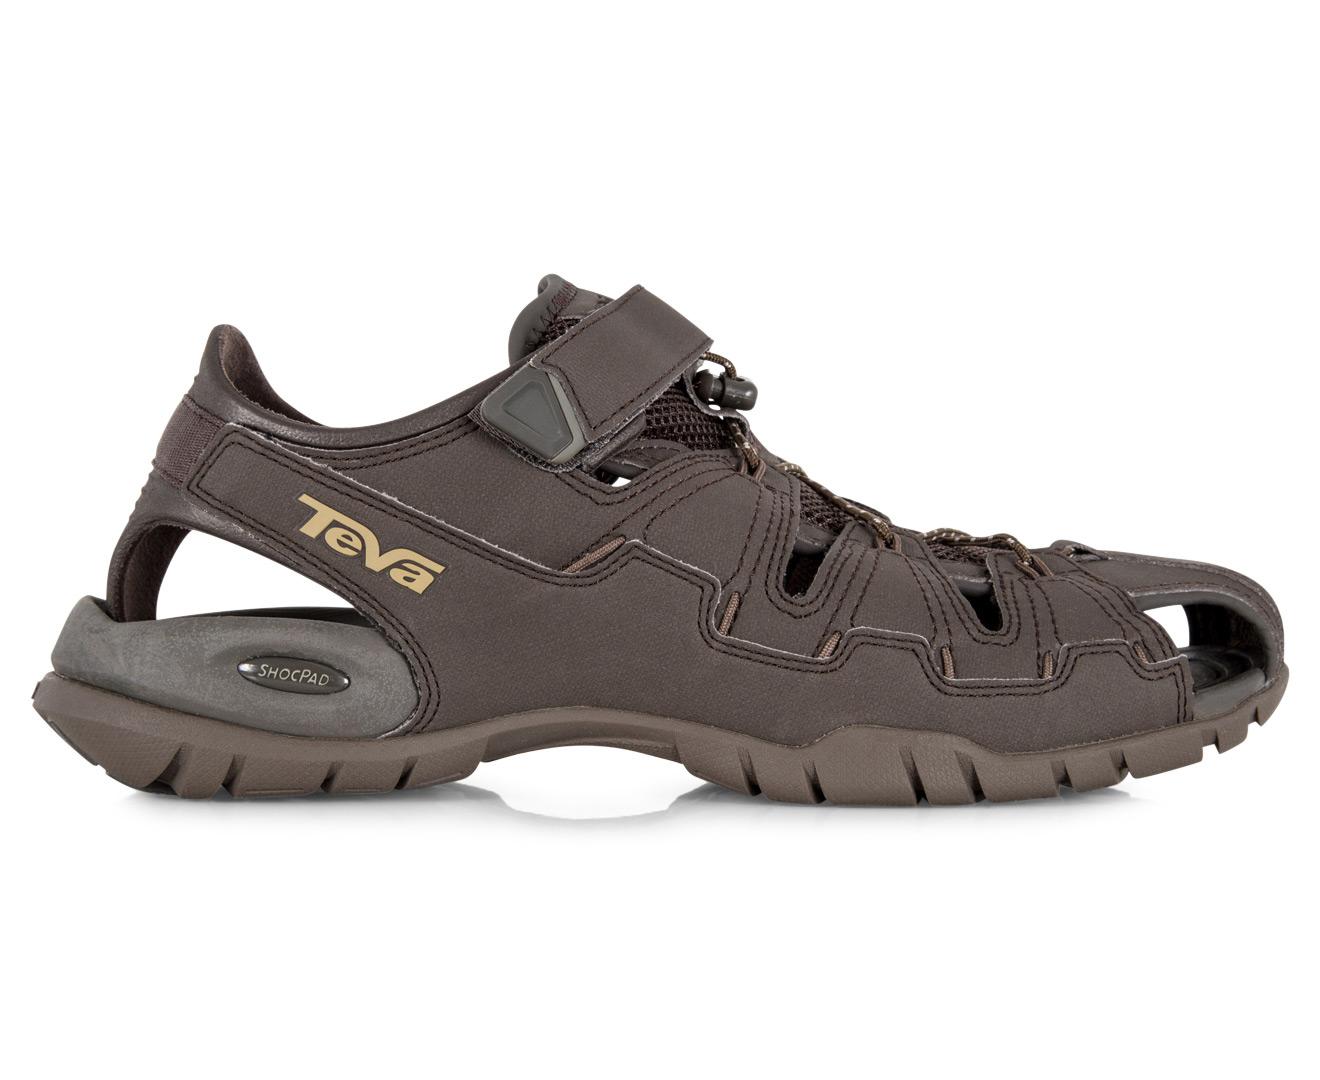 01fcf2e5cae8f Teva Men s Dozer 4 Sandal - Black Olive